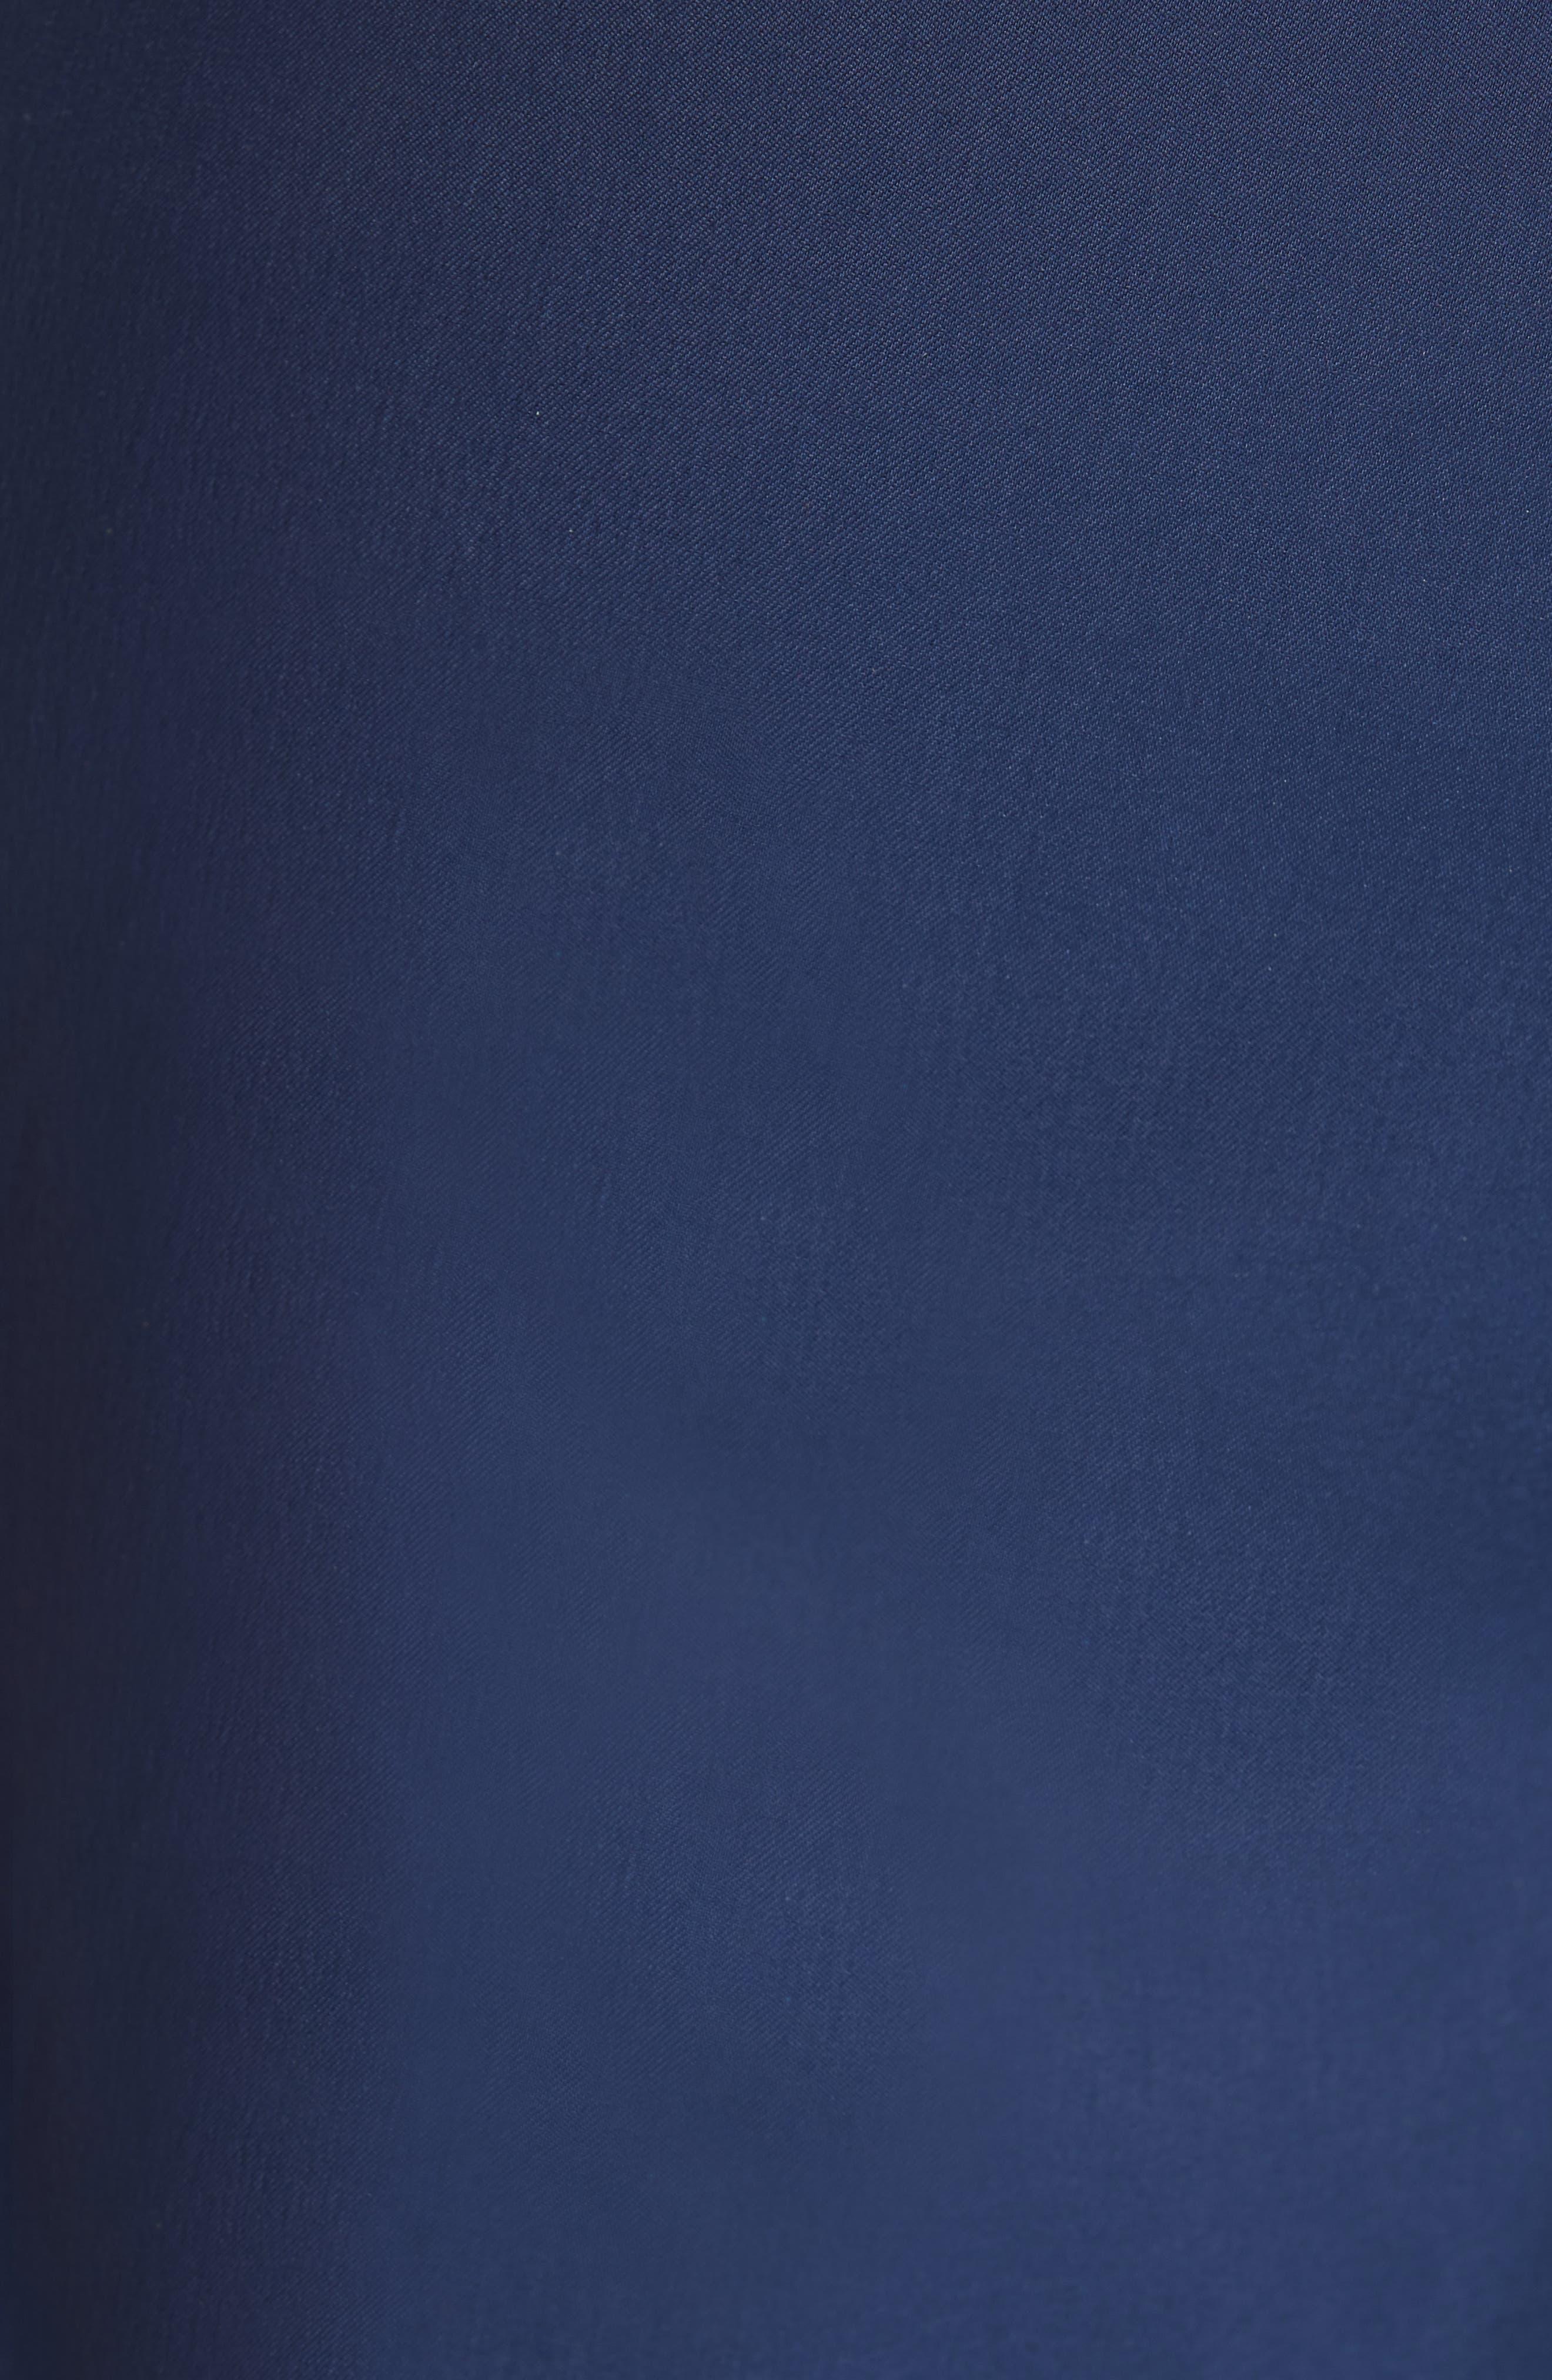 Tricolor Swim Trunks,                             Alternate thumbnail 5, color,                             BLUE